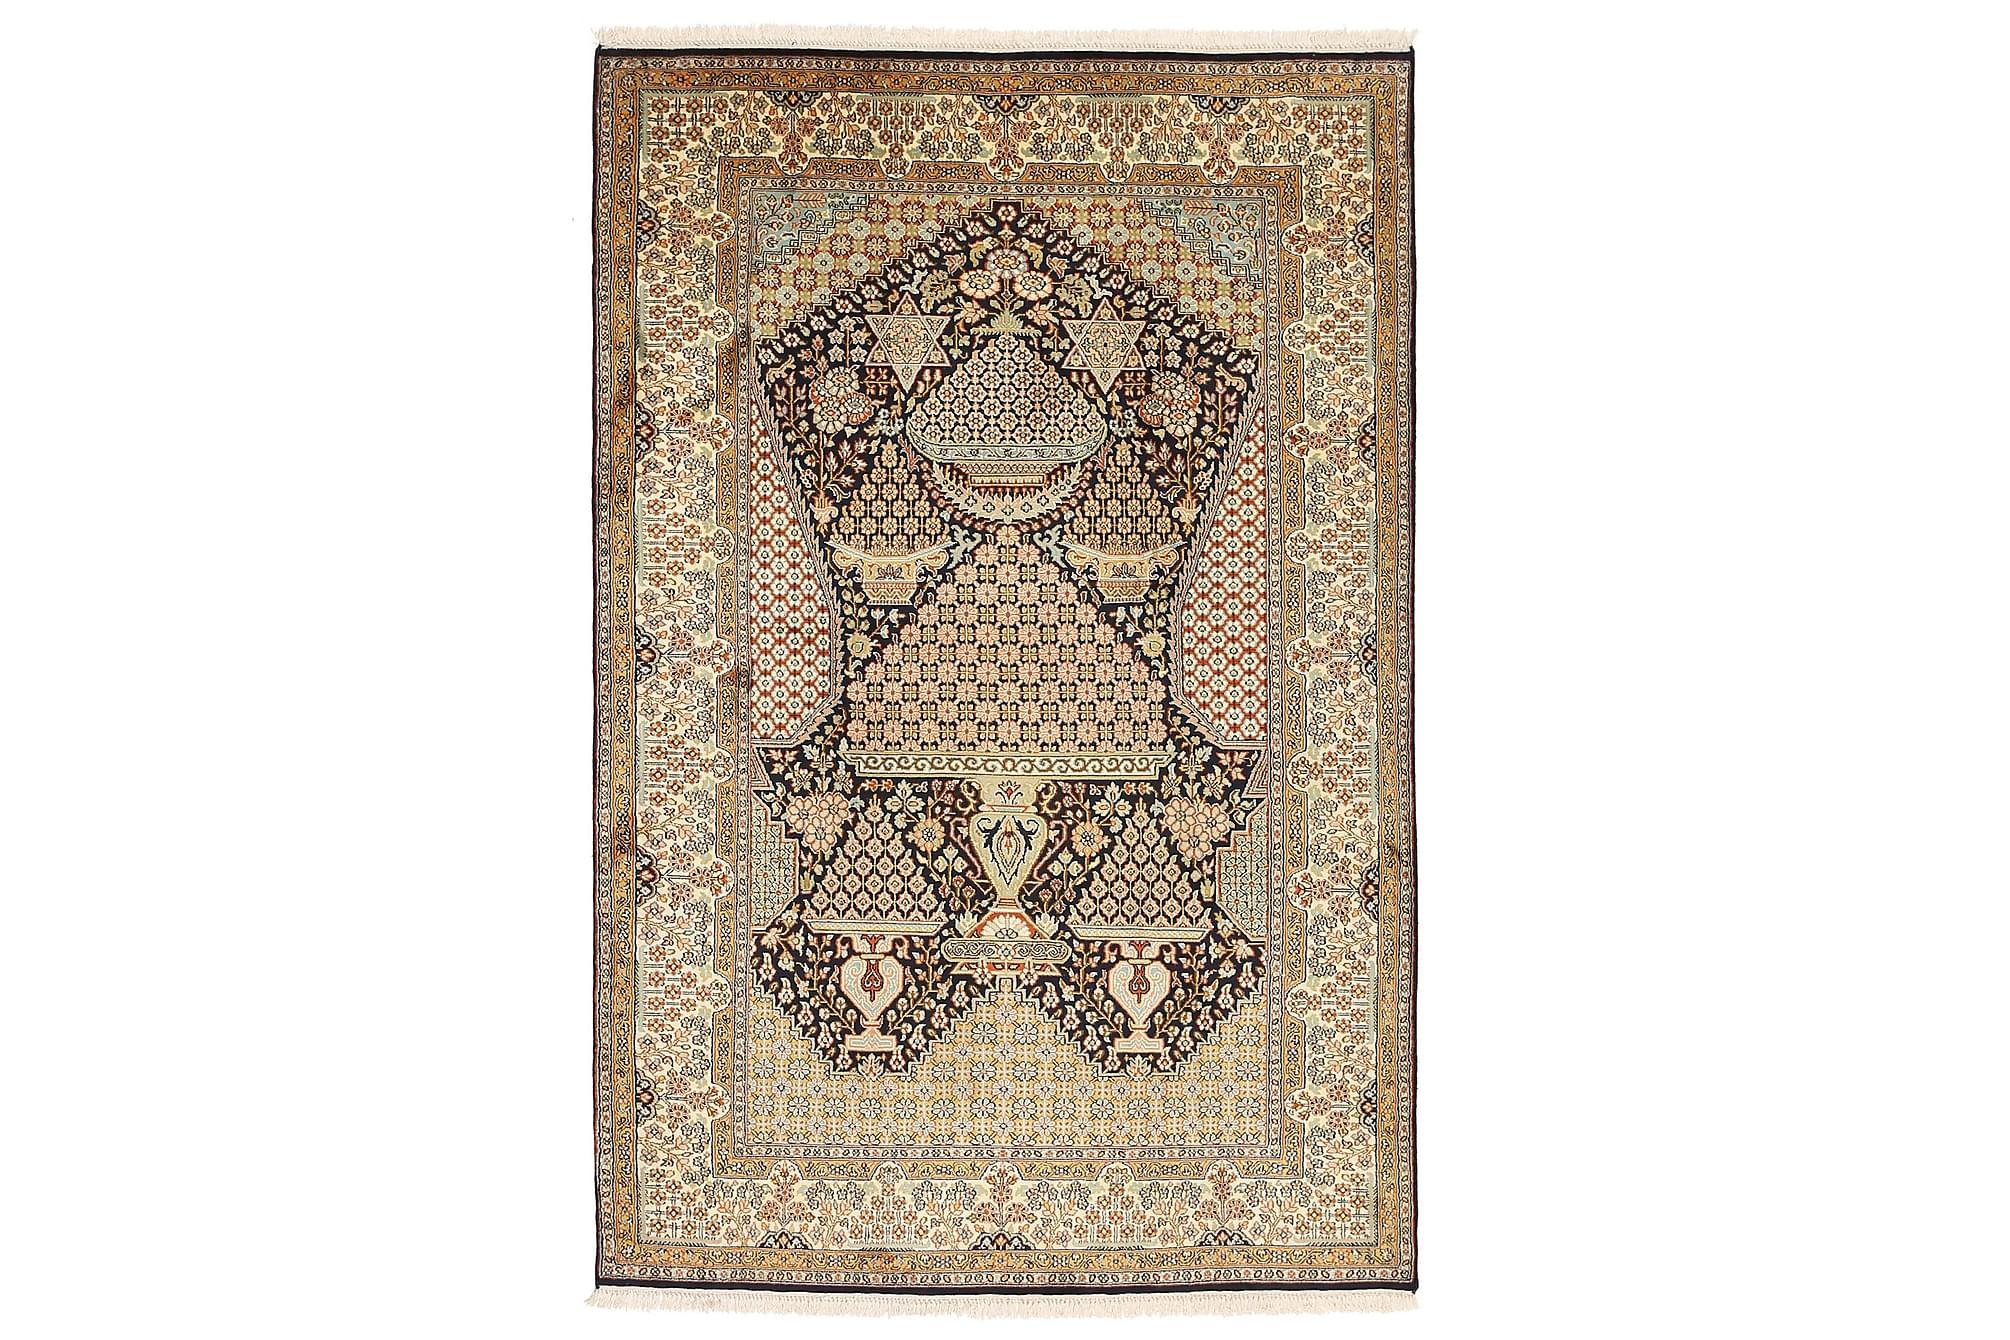 ORIENTALISK Silkesmatta Kashmir 126x191, Äkta silkesmattor